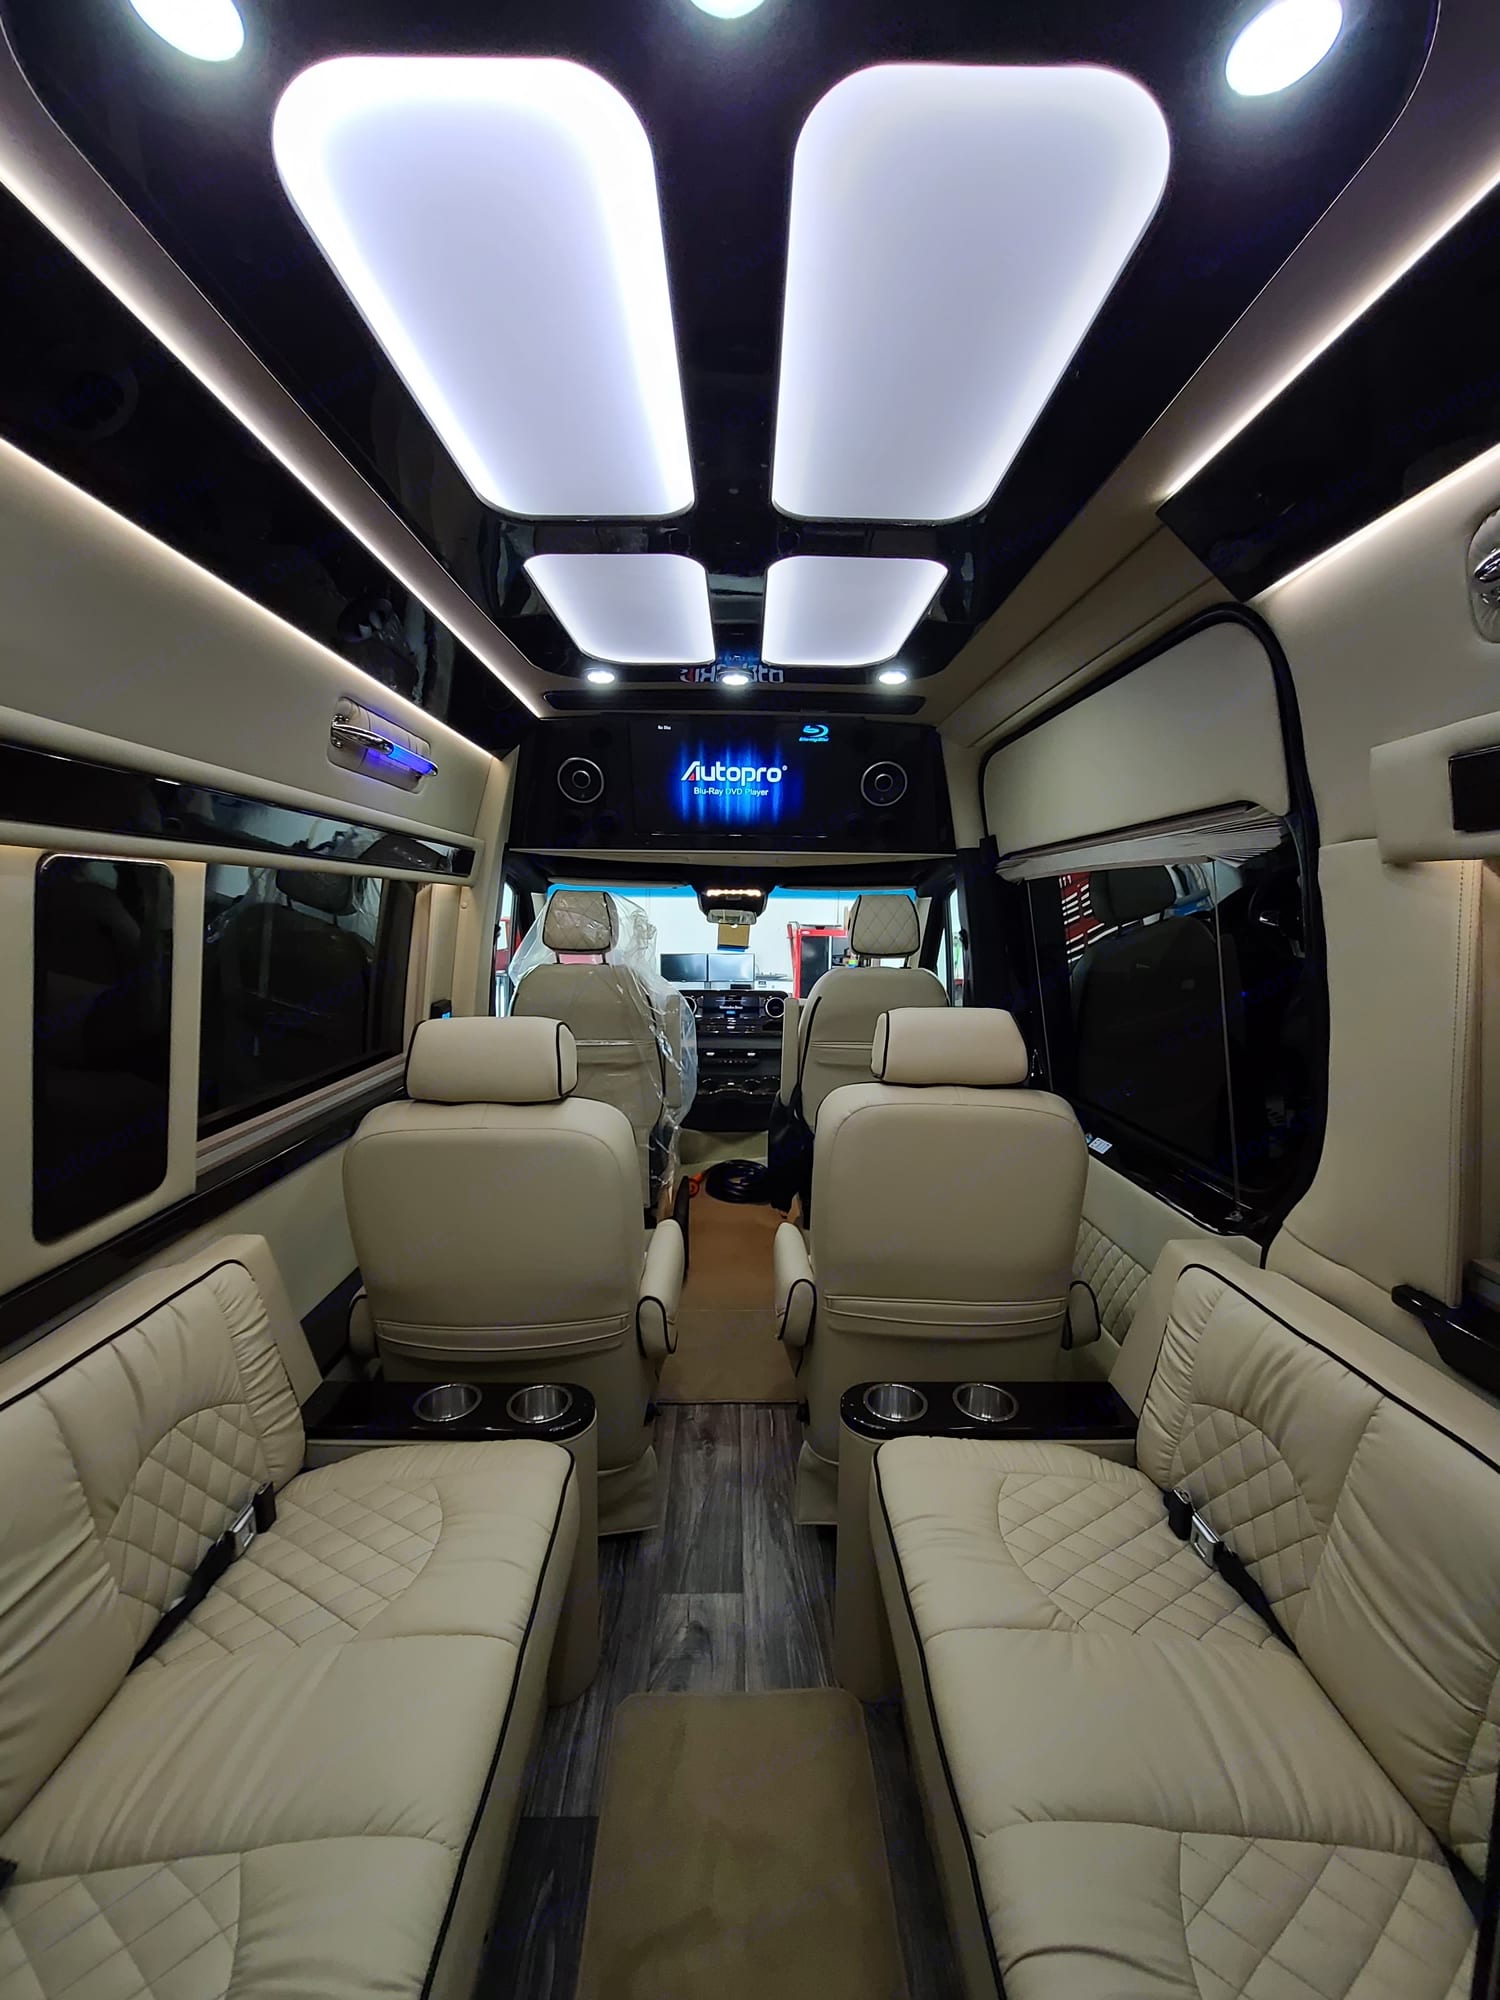 Front TV. Mercedes-Benz 4x4 Sprinter mwb 2021